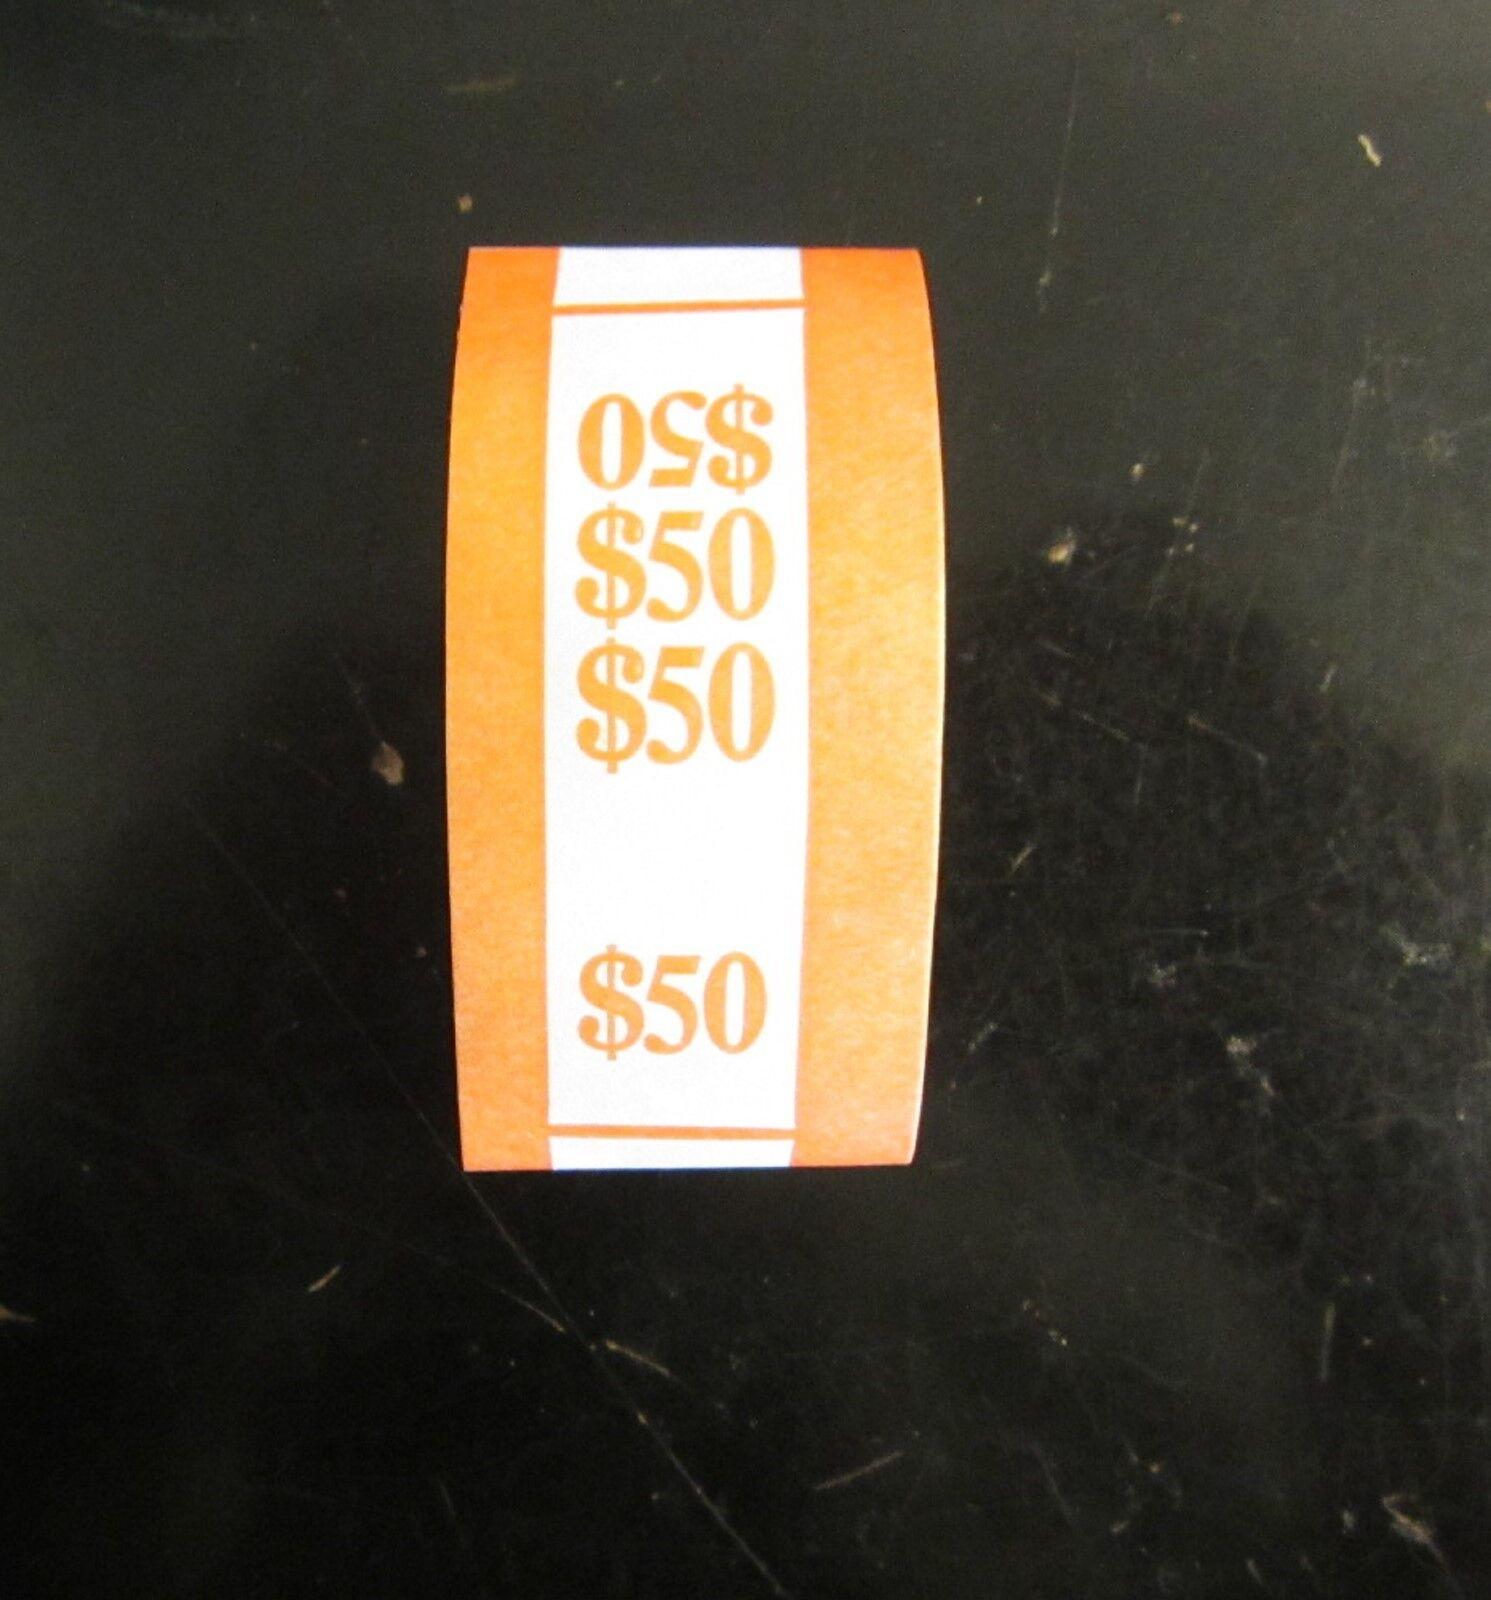 500 SELF SEALING ORANGE $50 CURRENCY STRAPS MONEY BILL BANDS $50 PMC BRAND STRAP